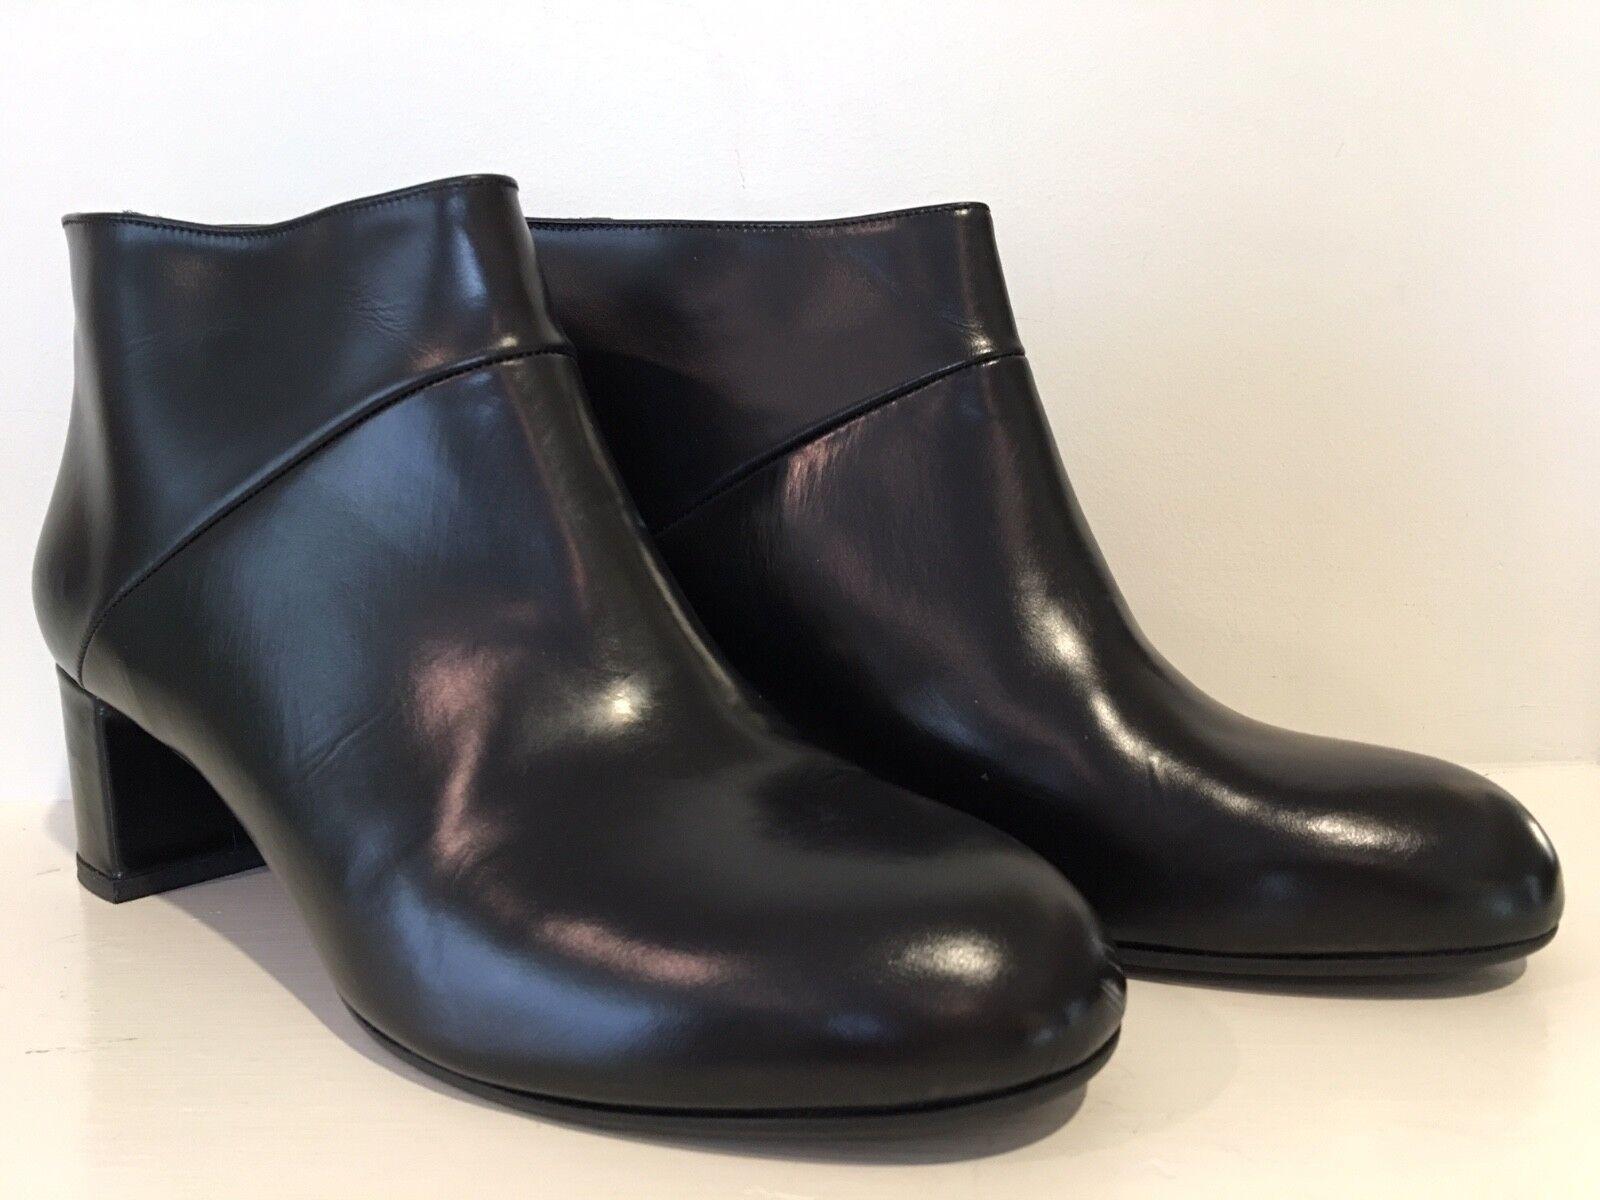 Nuevas botas al Tobillo Marni Marni Marni Cuero Negro, tamaño 41 11  deportes calientes